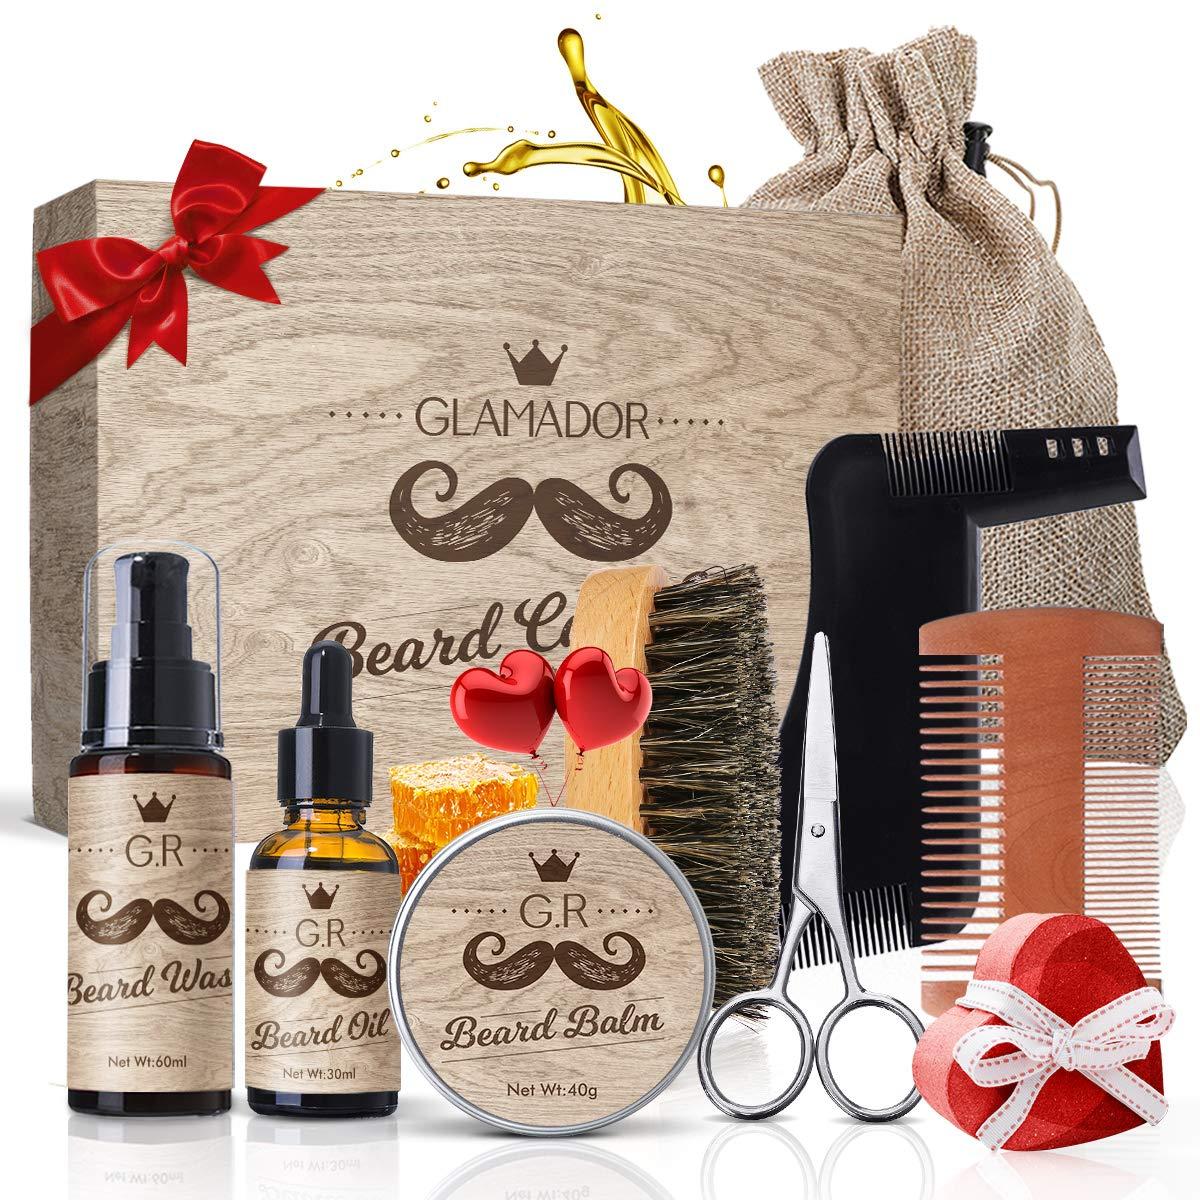 9-in-1 Beard Grooming Kits GLAMADOR Beard Trimming Set, Beard Oil Beard Balm ,Mustache & Beard Care Birthday Gift Set, Professional Beard Care Kit for Men/Dad/Husband with Beard Comb Brush